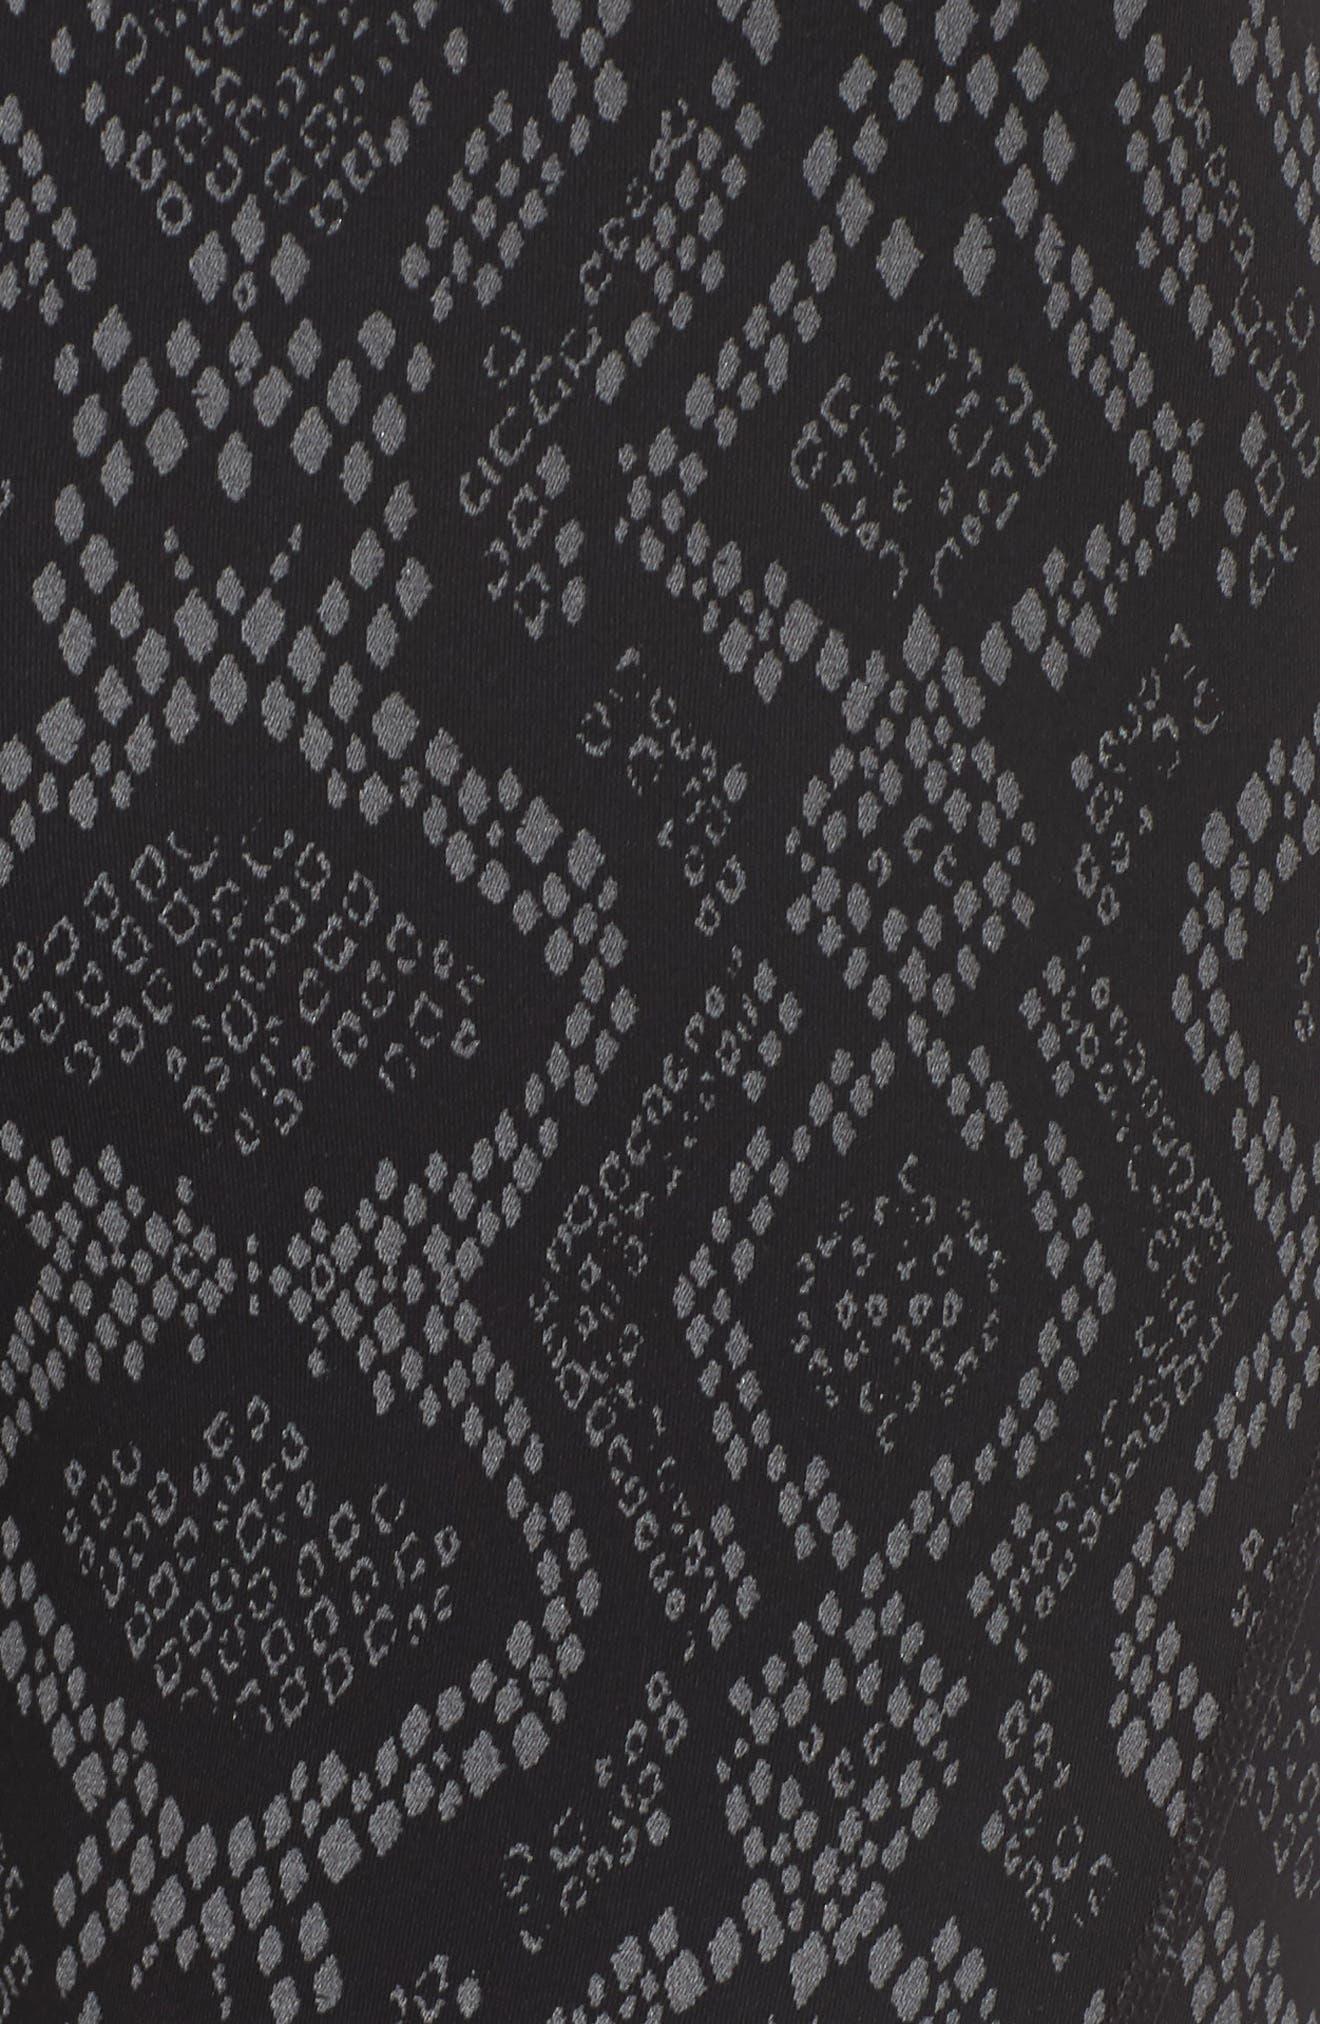 Alden Crop Tights,                             Alternate thumbnail 6, color,                             Midnight Python